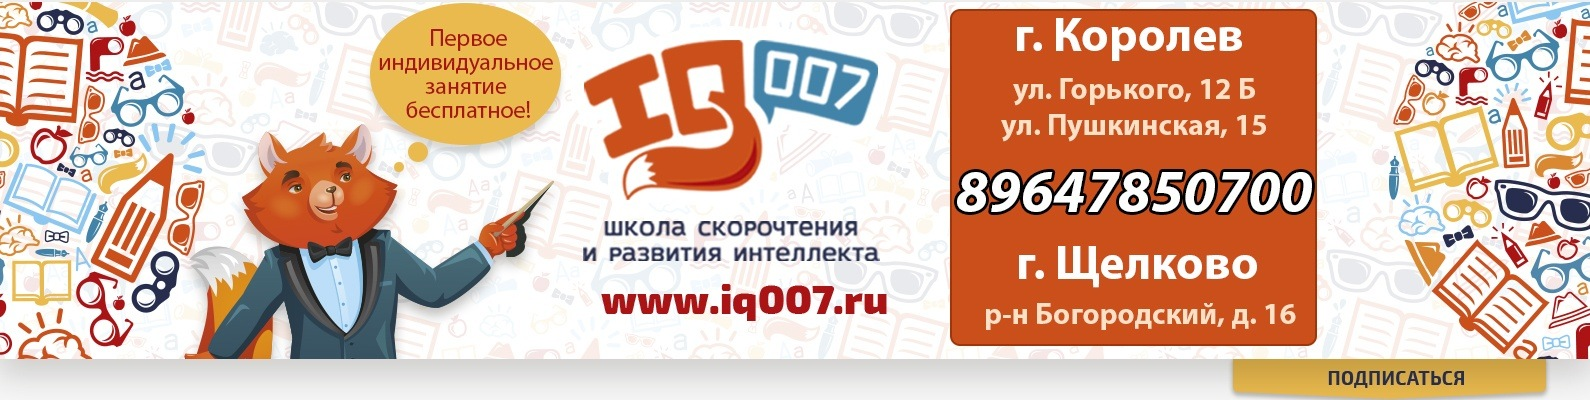 Alpha-PVP гидра Сызрань МДМА online Евпатория